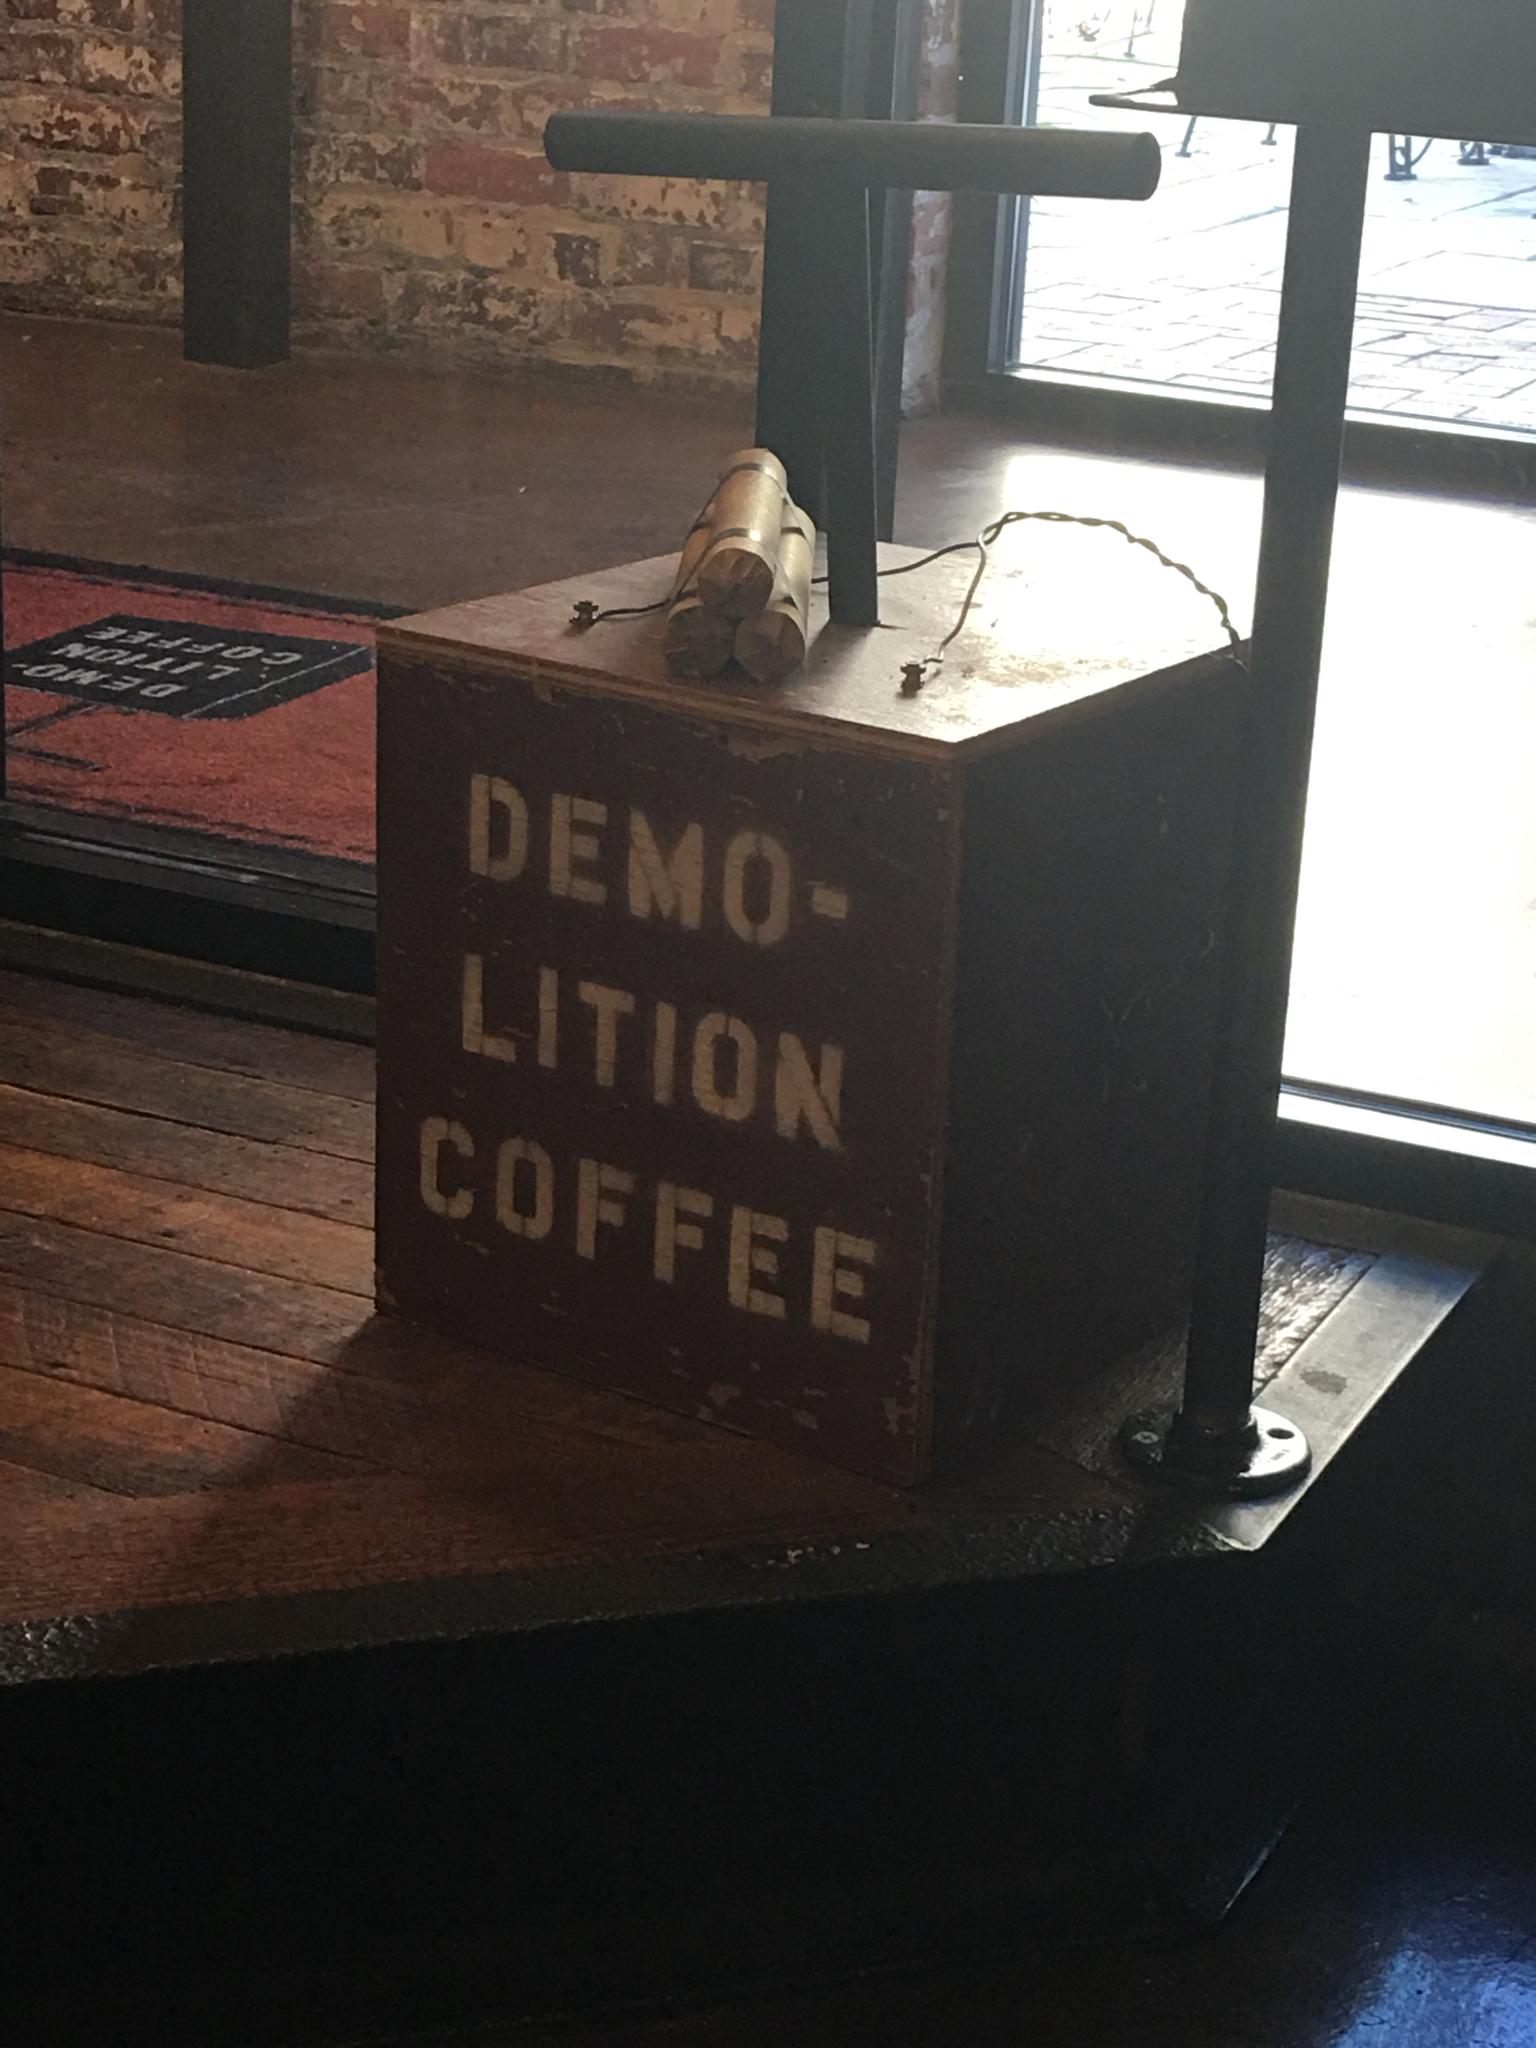 Demolition Coffee, Petersburg VA